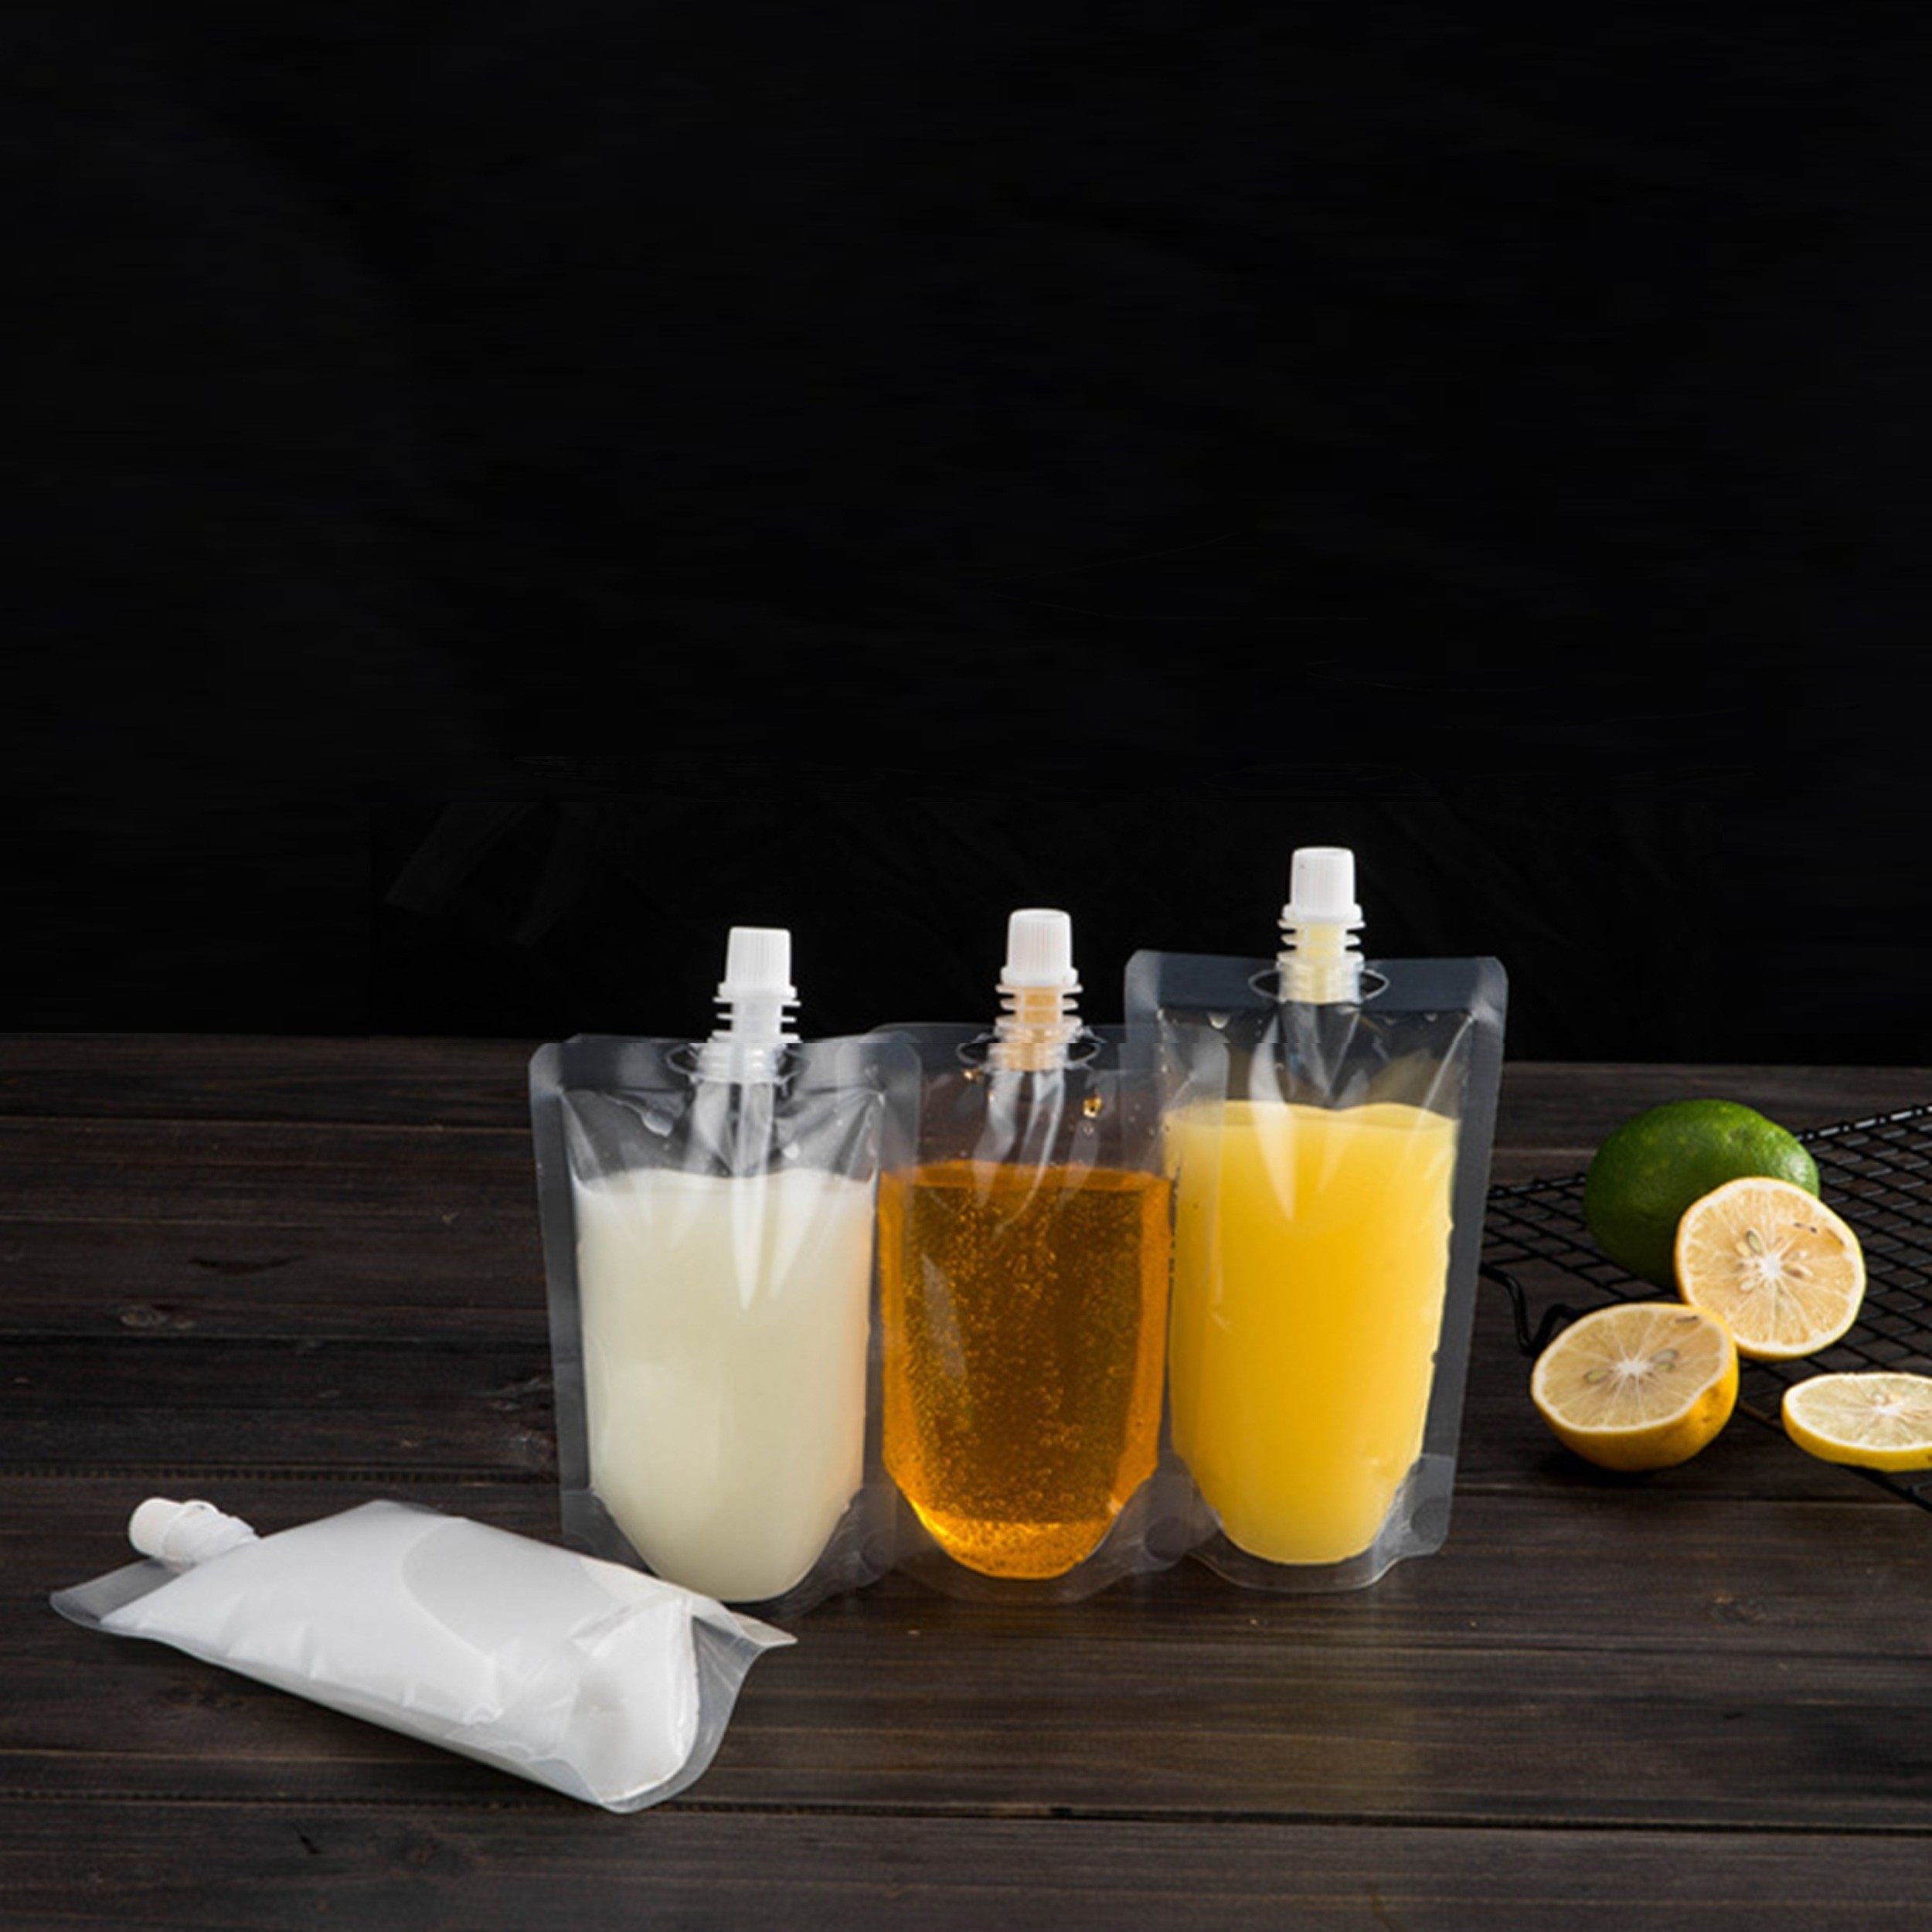 6.7 oz (200 ml) Transparent Clear Beverage Stand-Up Reusable Pouch with Screw Cap Spout Bottles (250 Bags/Lot)